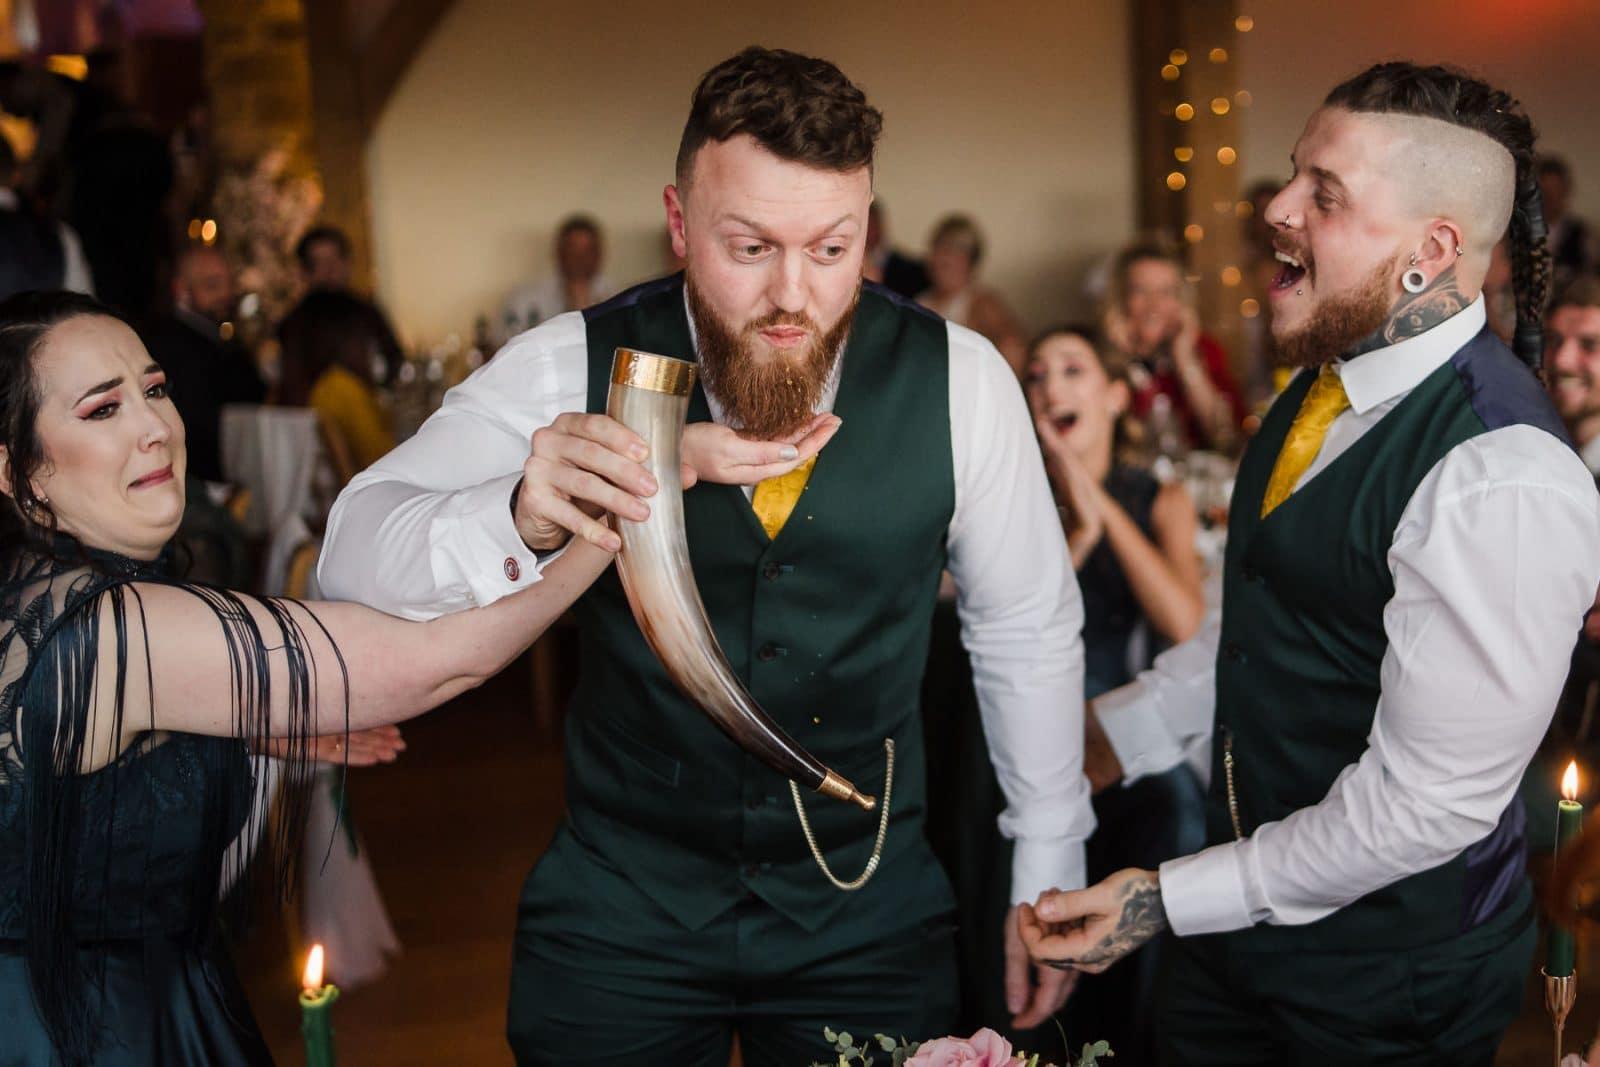 Groomsmen skolling a horn and spilling